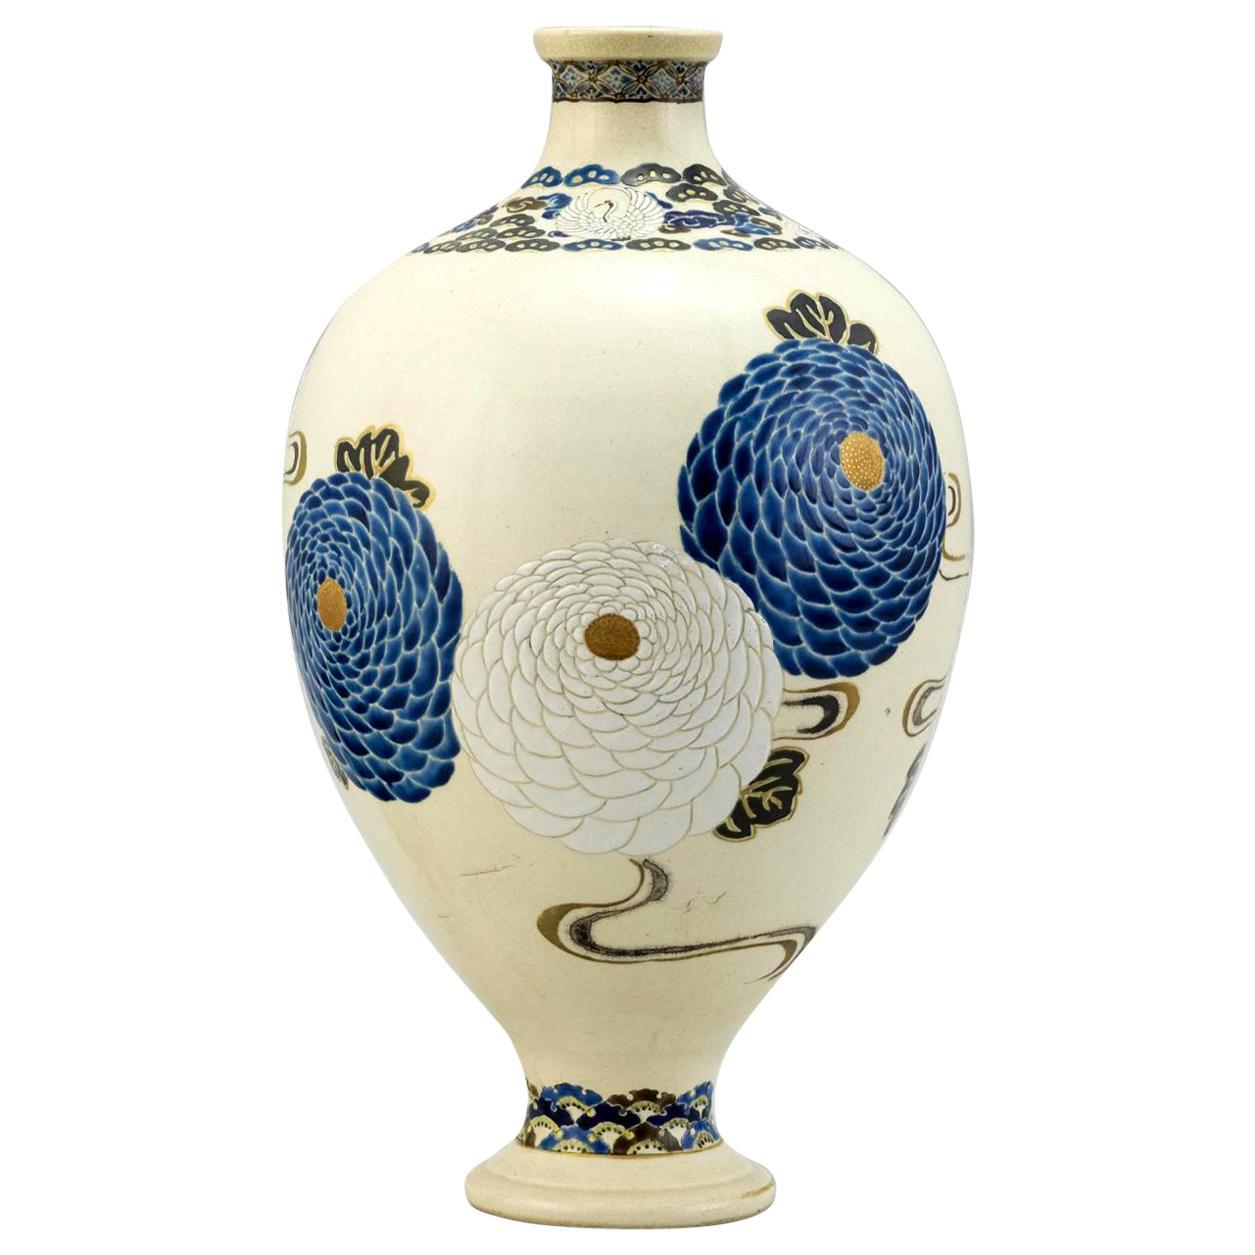 Japanese Satsuma Kyoto Ware Ceramic Vase Meiji Period